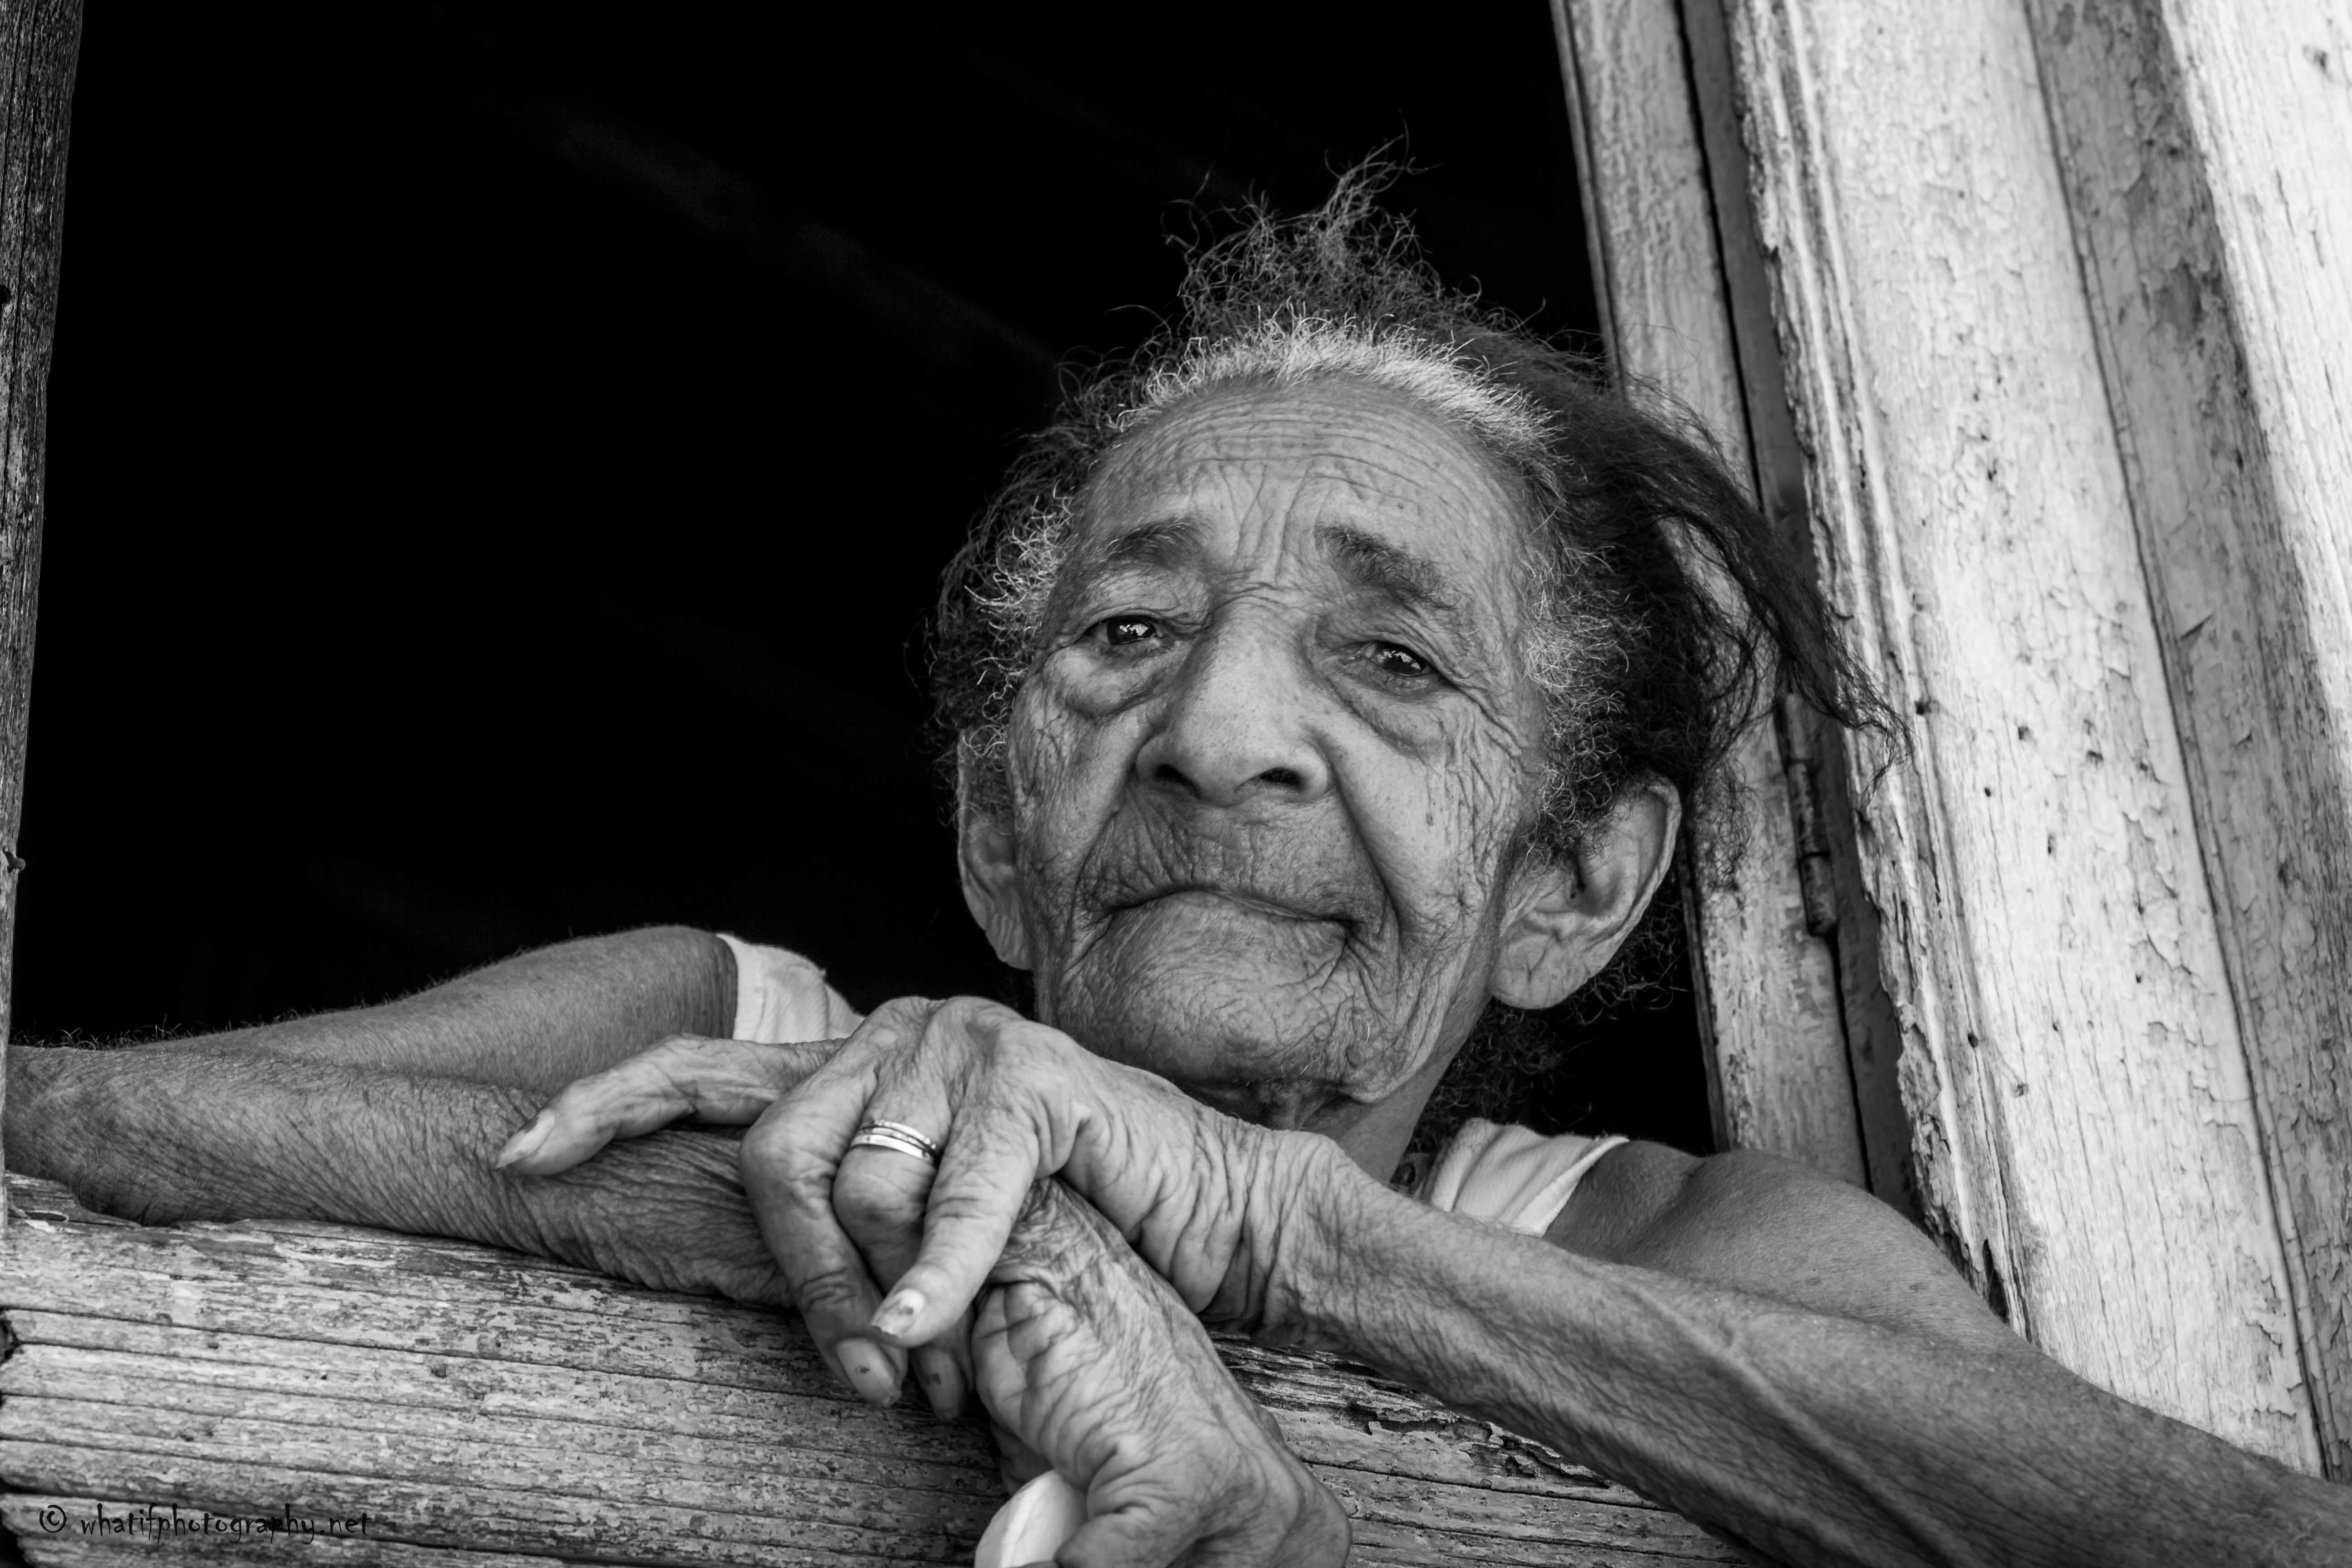 Wisdom in the window frame